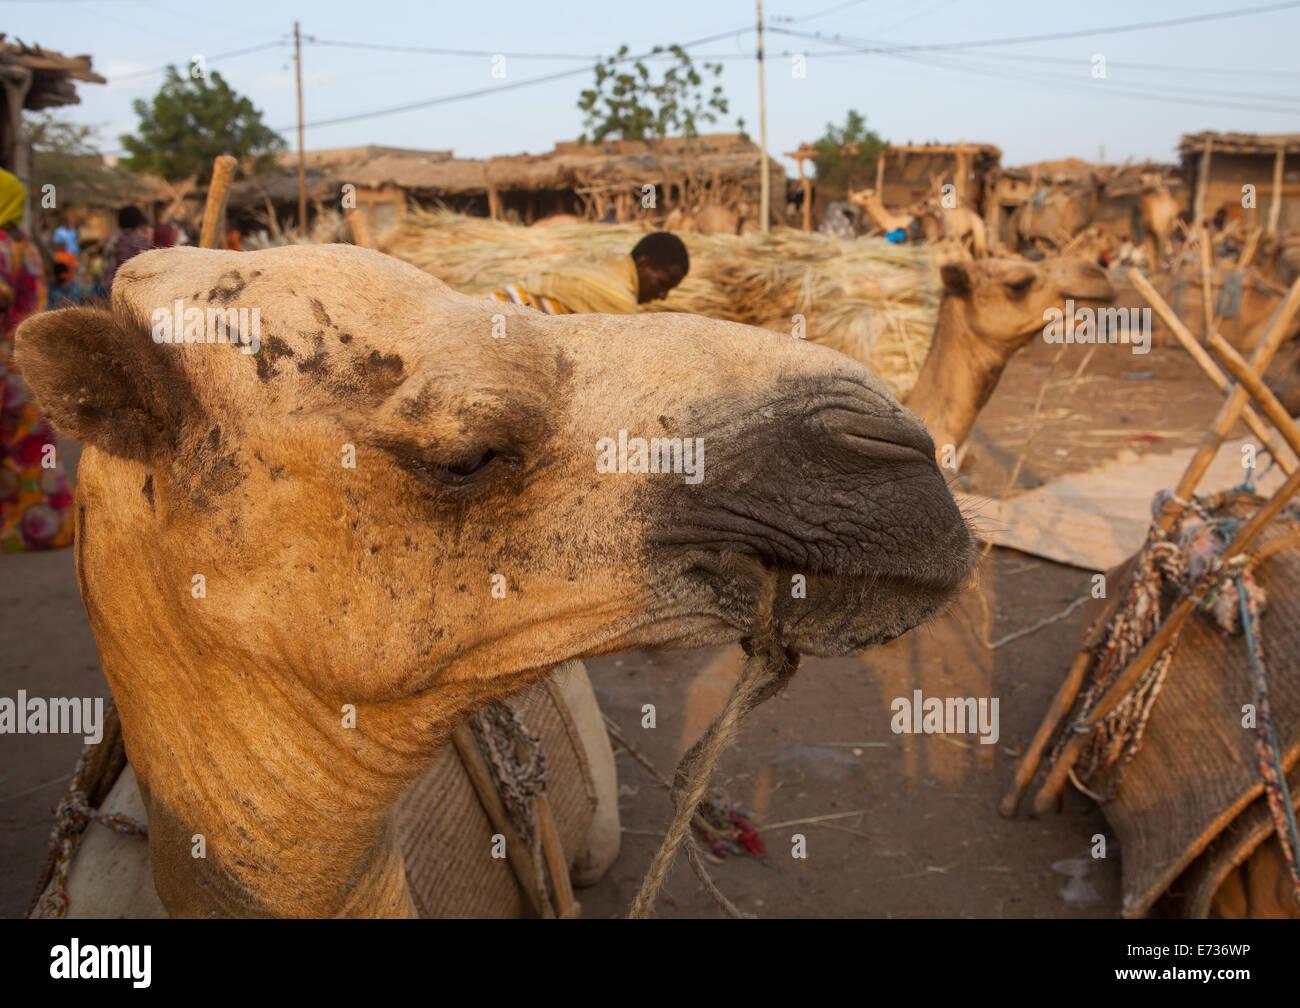 Assayta Camel Market, Afar Region, Ethiopia - Stock Image